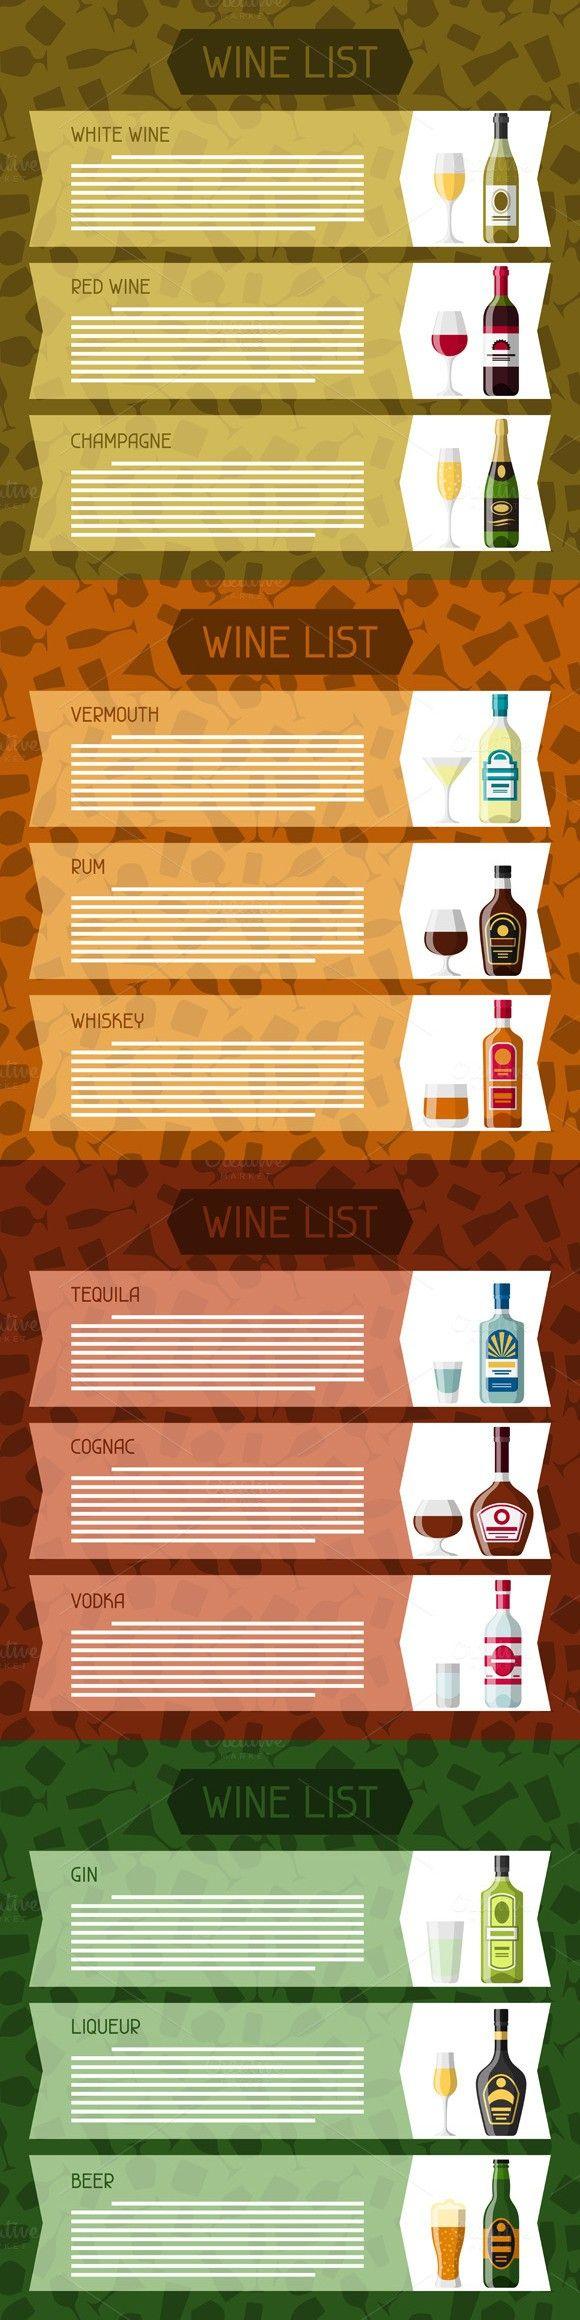 Alcohol drinks menu or wine list.